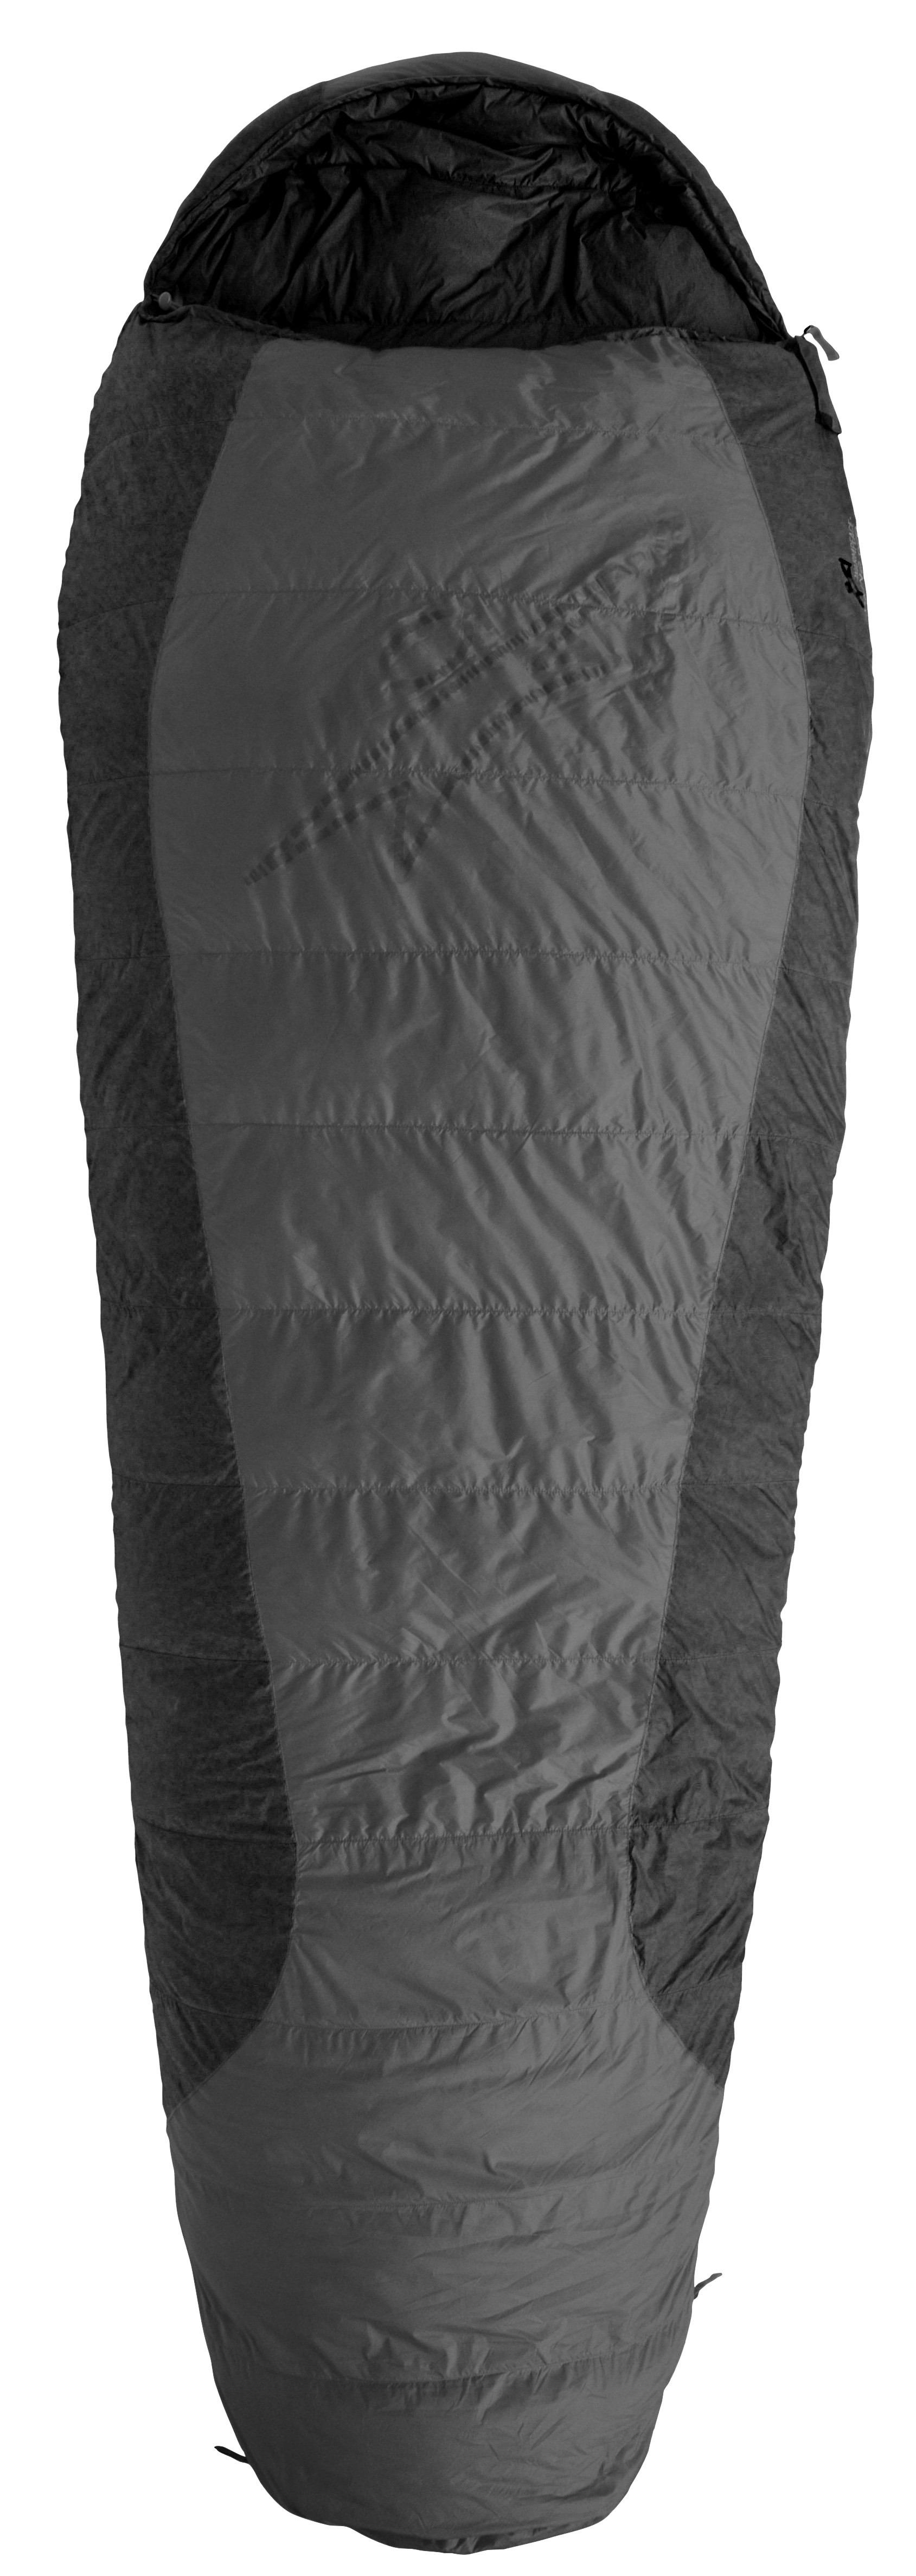 Sac de dormit puf Warmpeace Viking 900 Wide - Gri